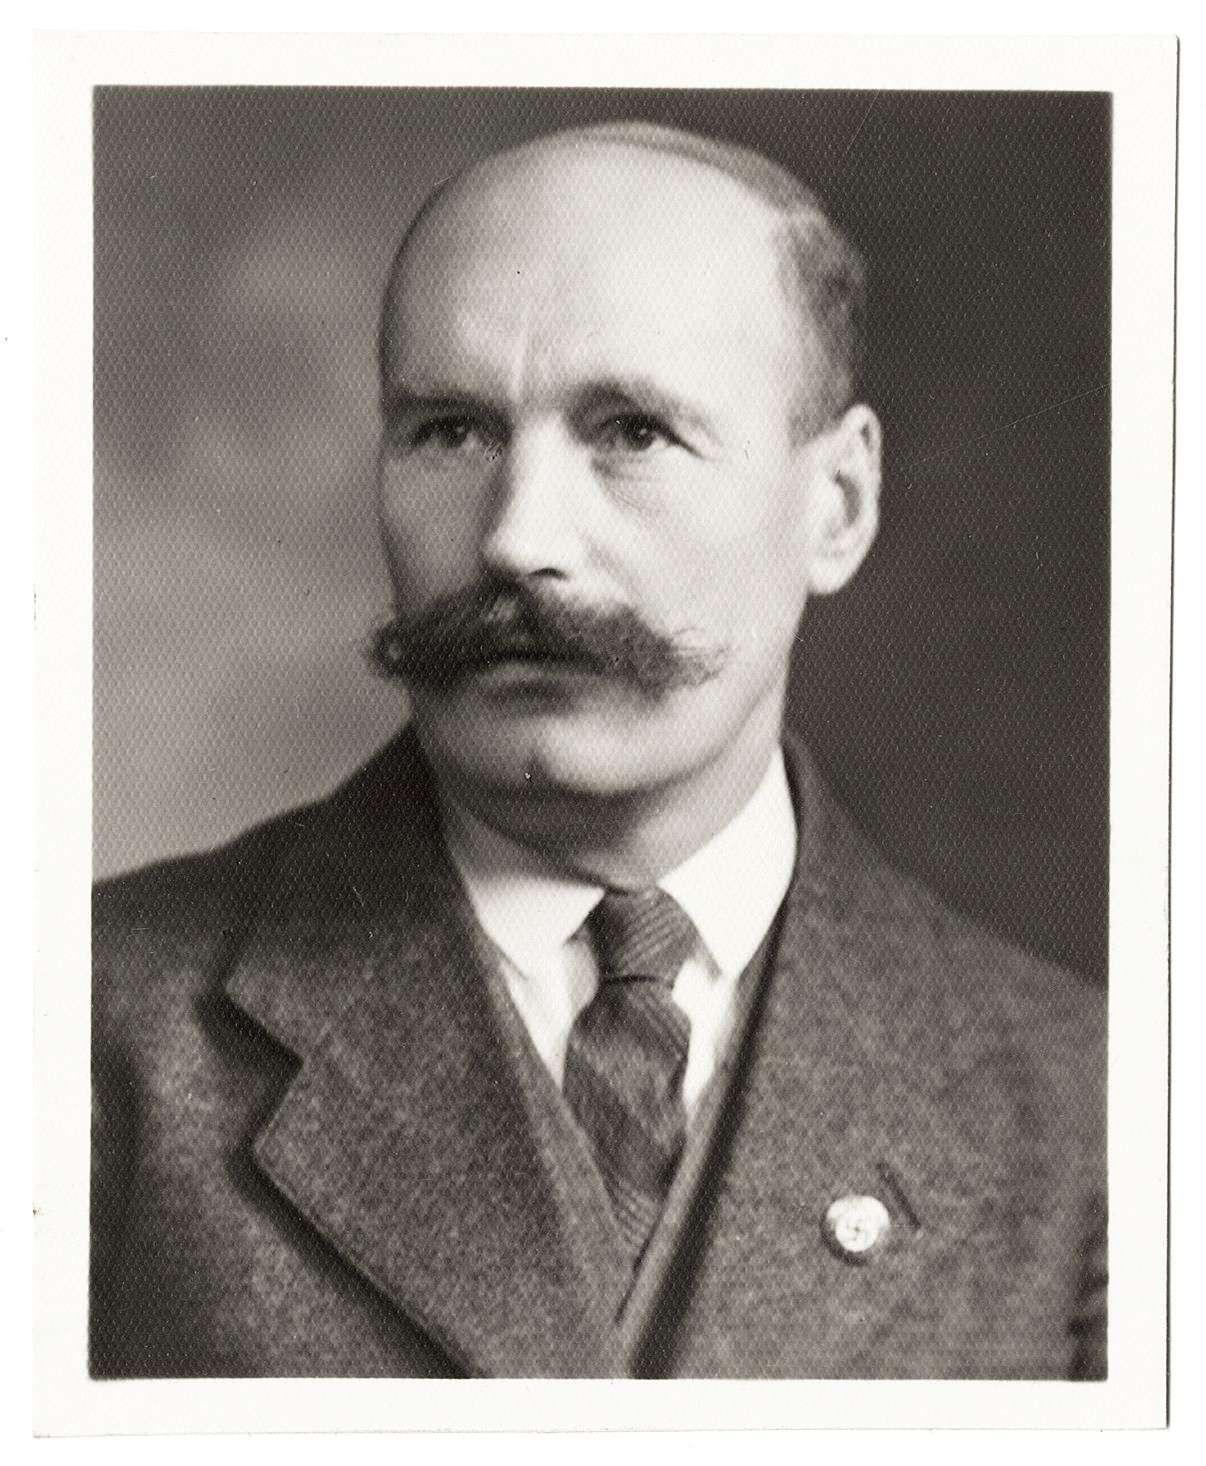 Röger, Robert, Bild 2